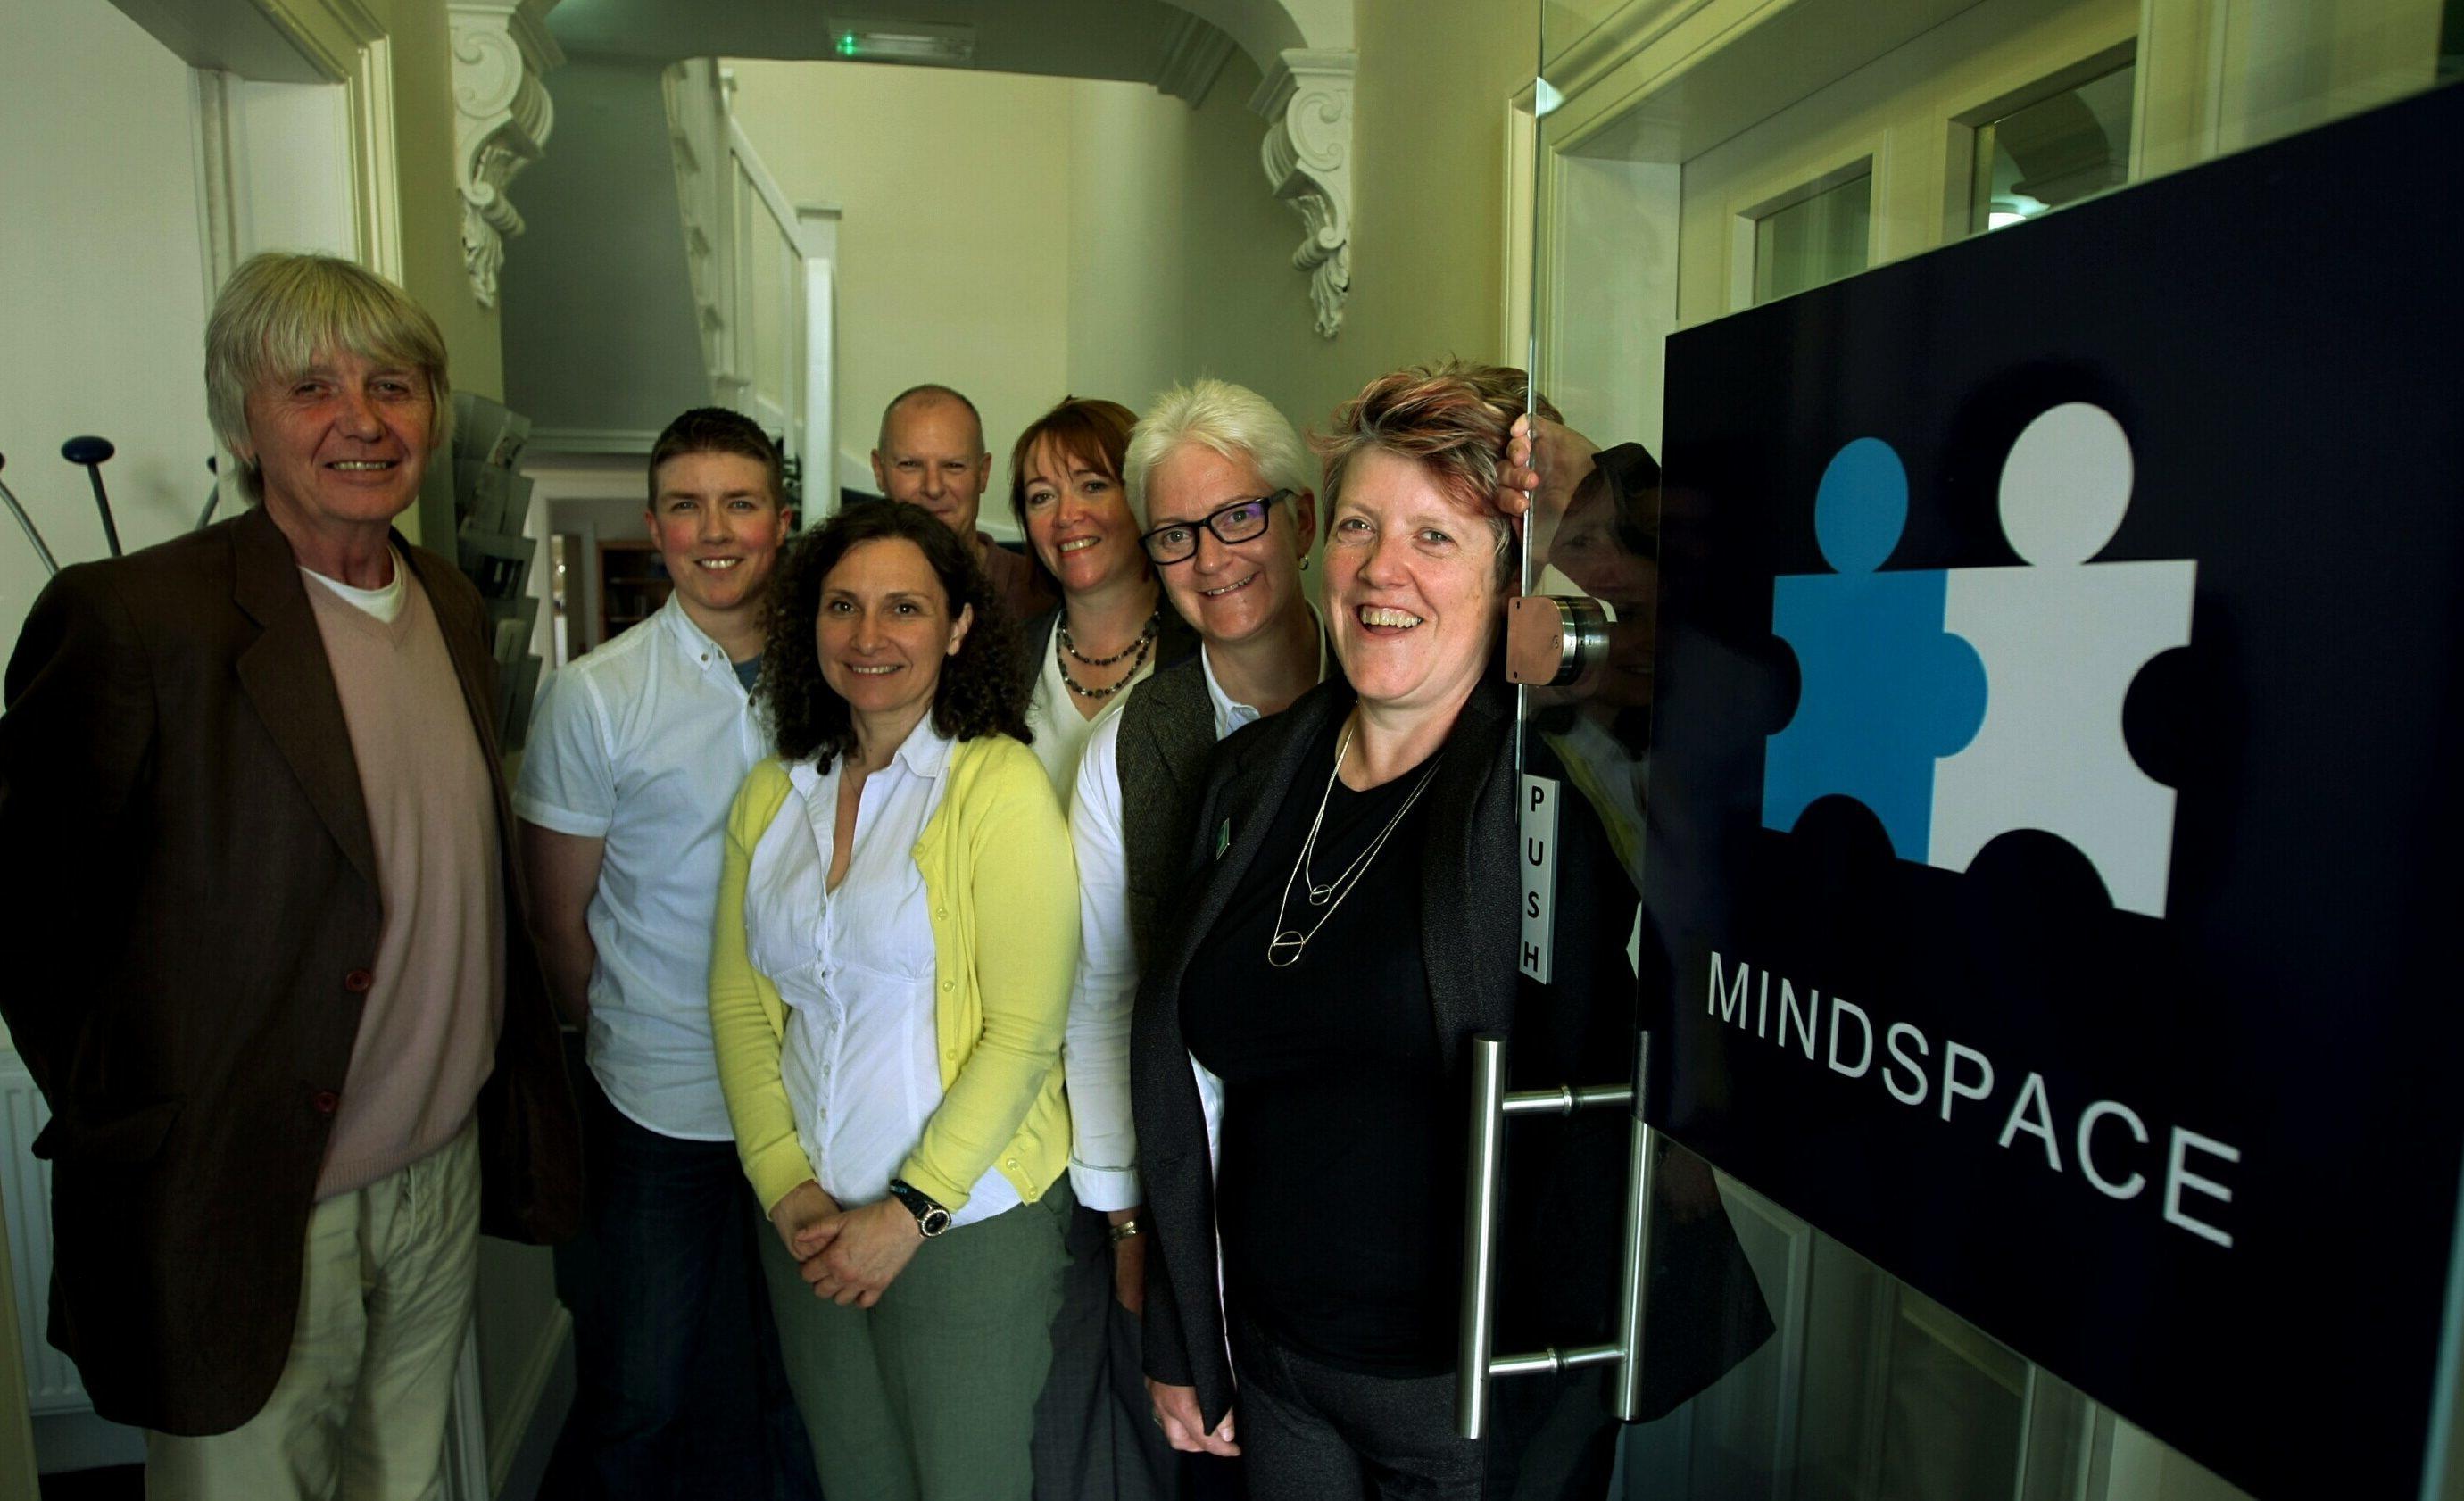 L/R, Alastair Jamieson, Alex Taylor, Andreja Mclean, Douglas Stewart, Alison McKay, Jillian Milne - Chief Executive, and Amanda Millar - Chairman.